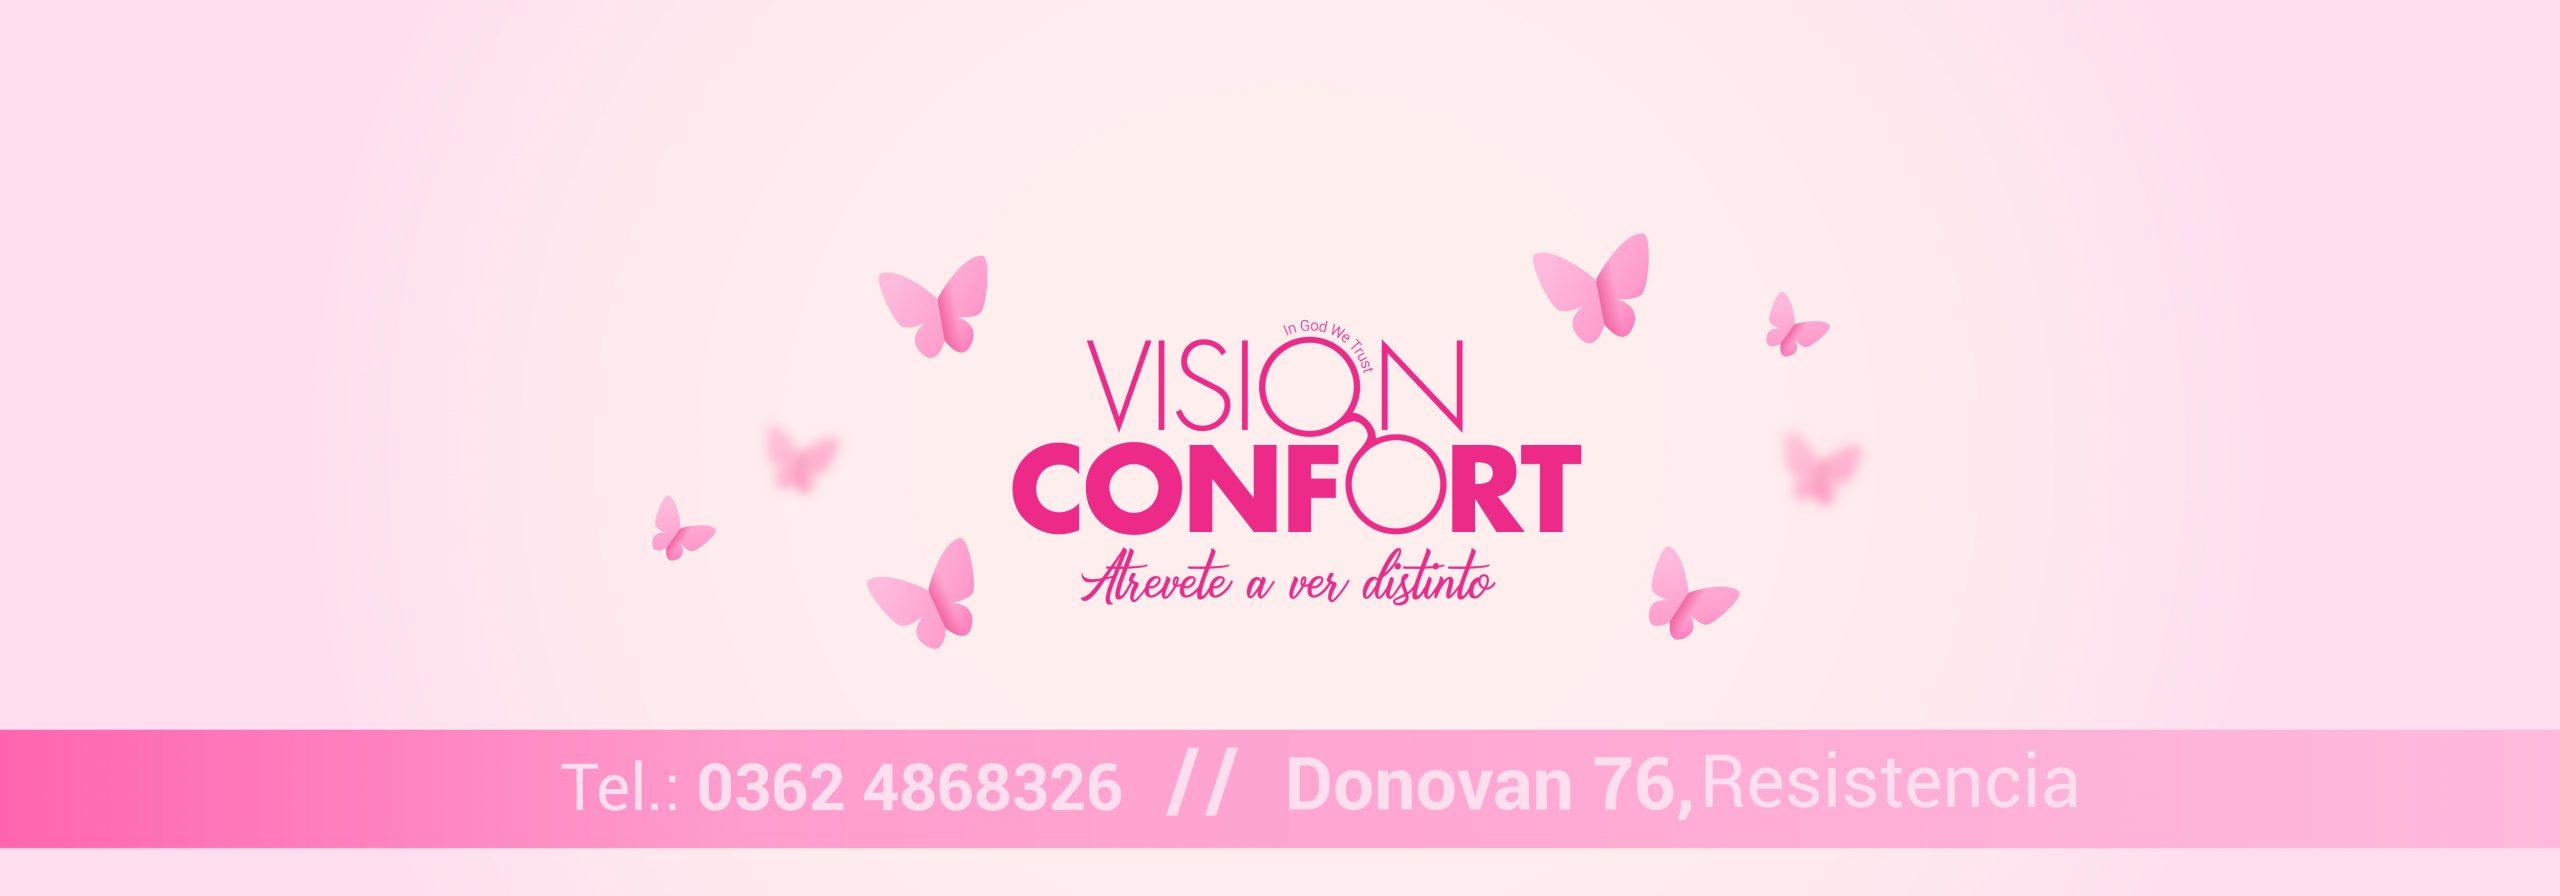 VISION CONFORT- web-03